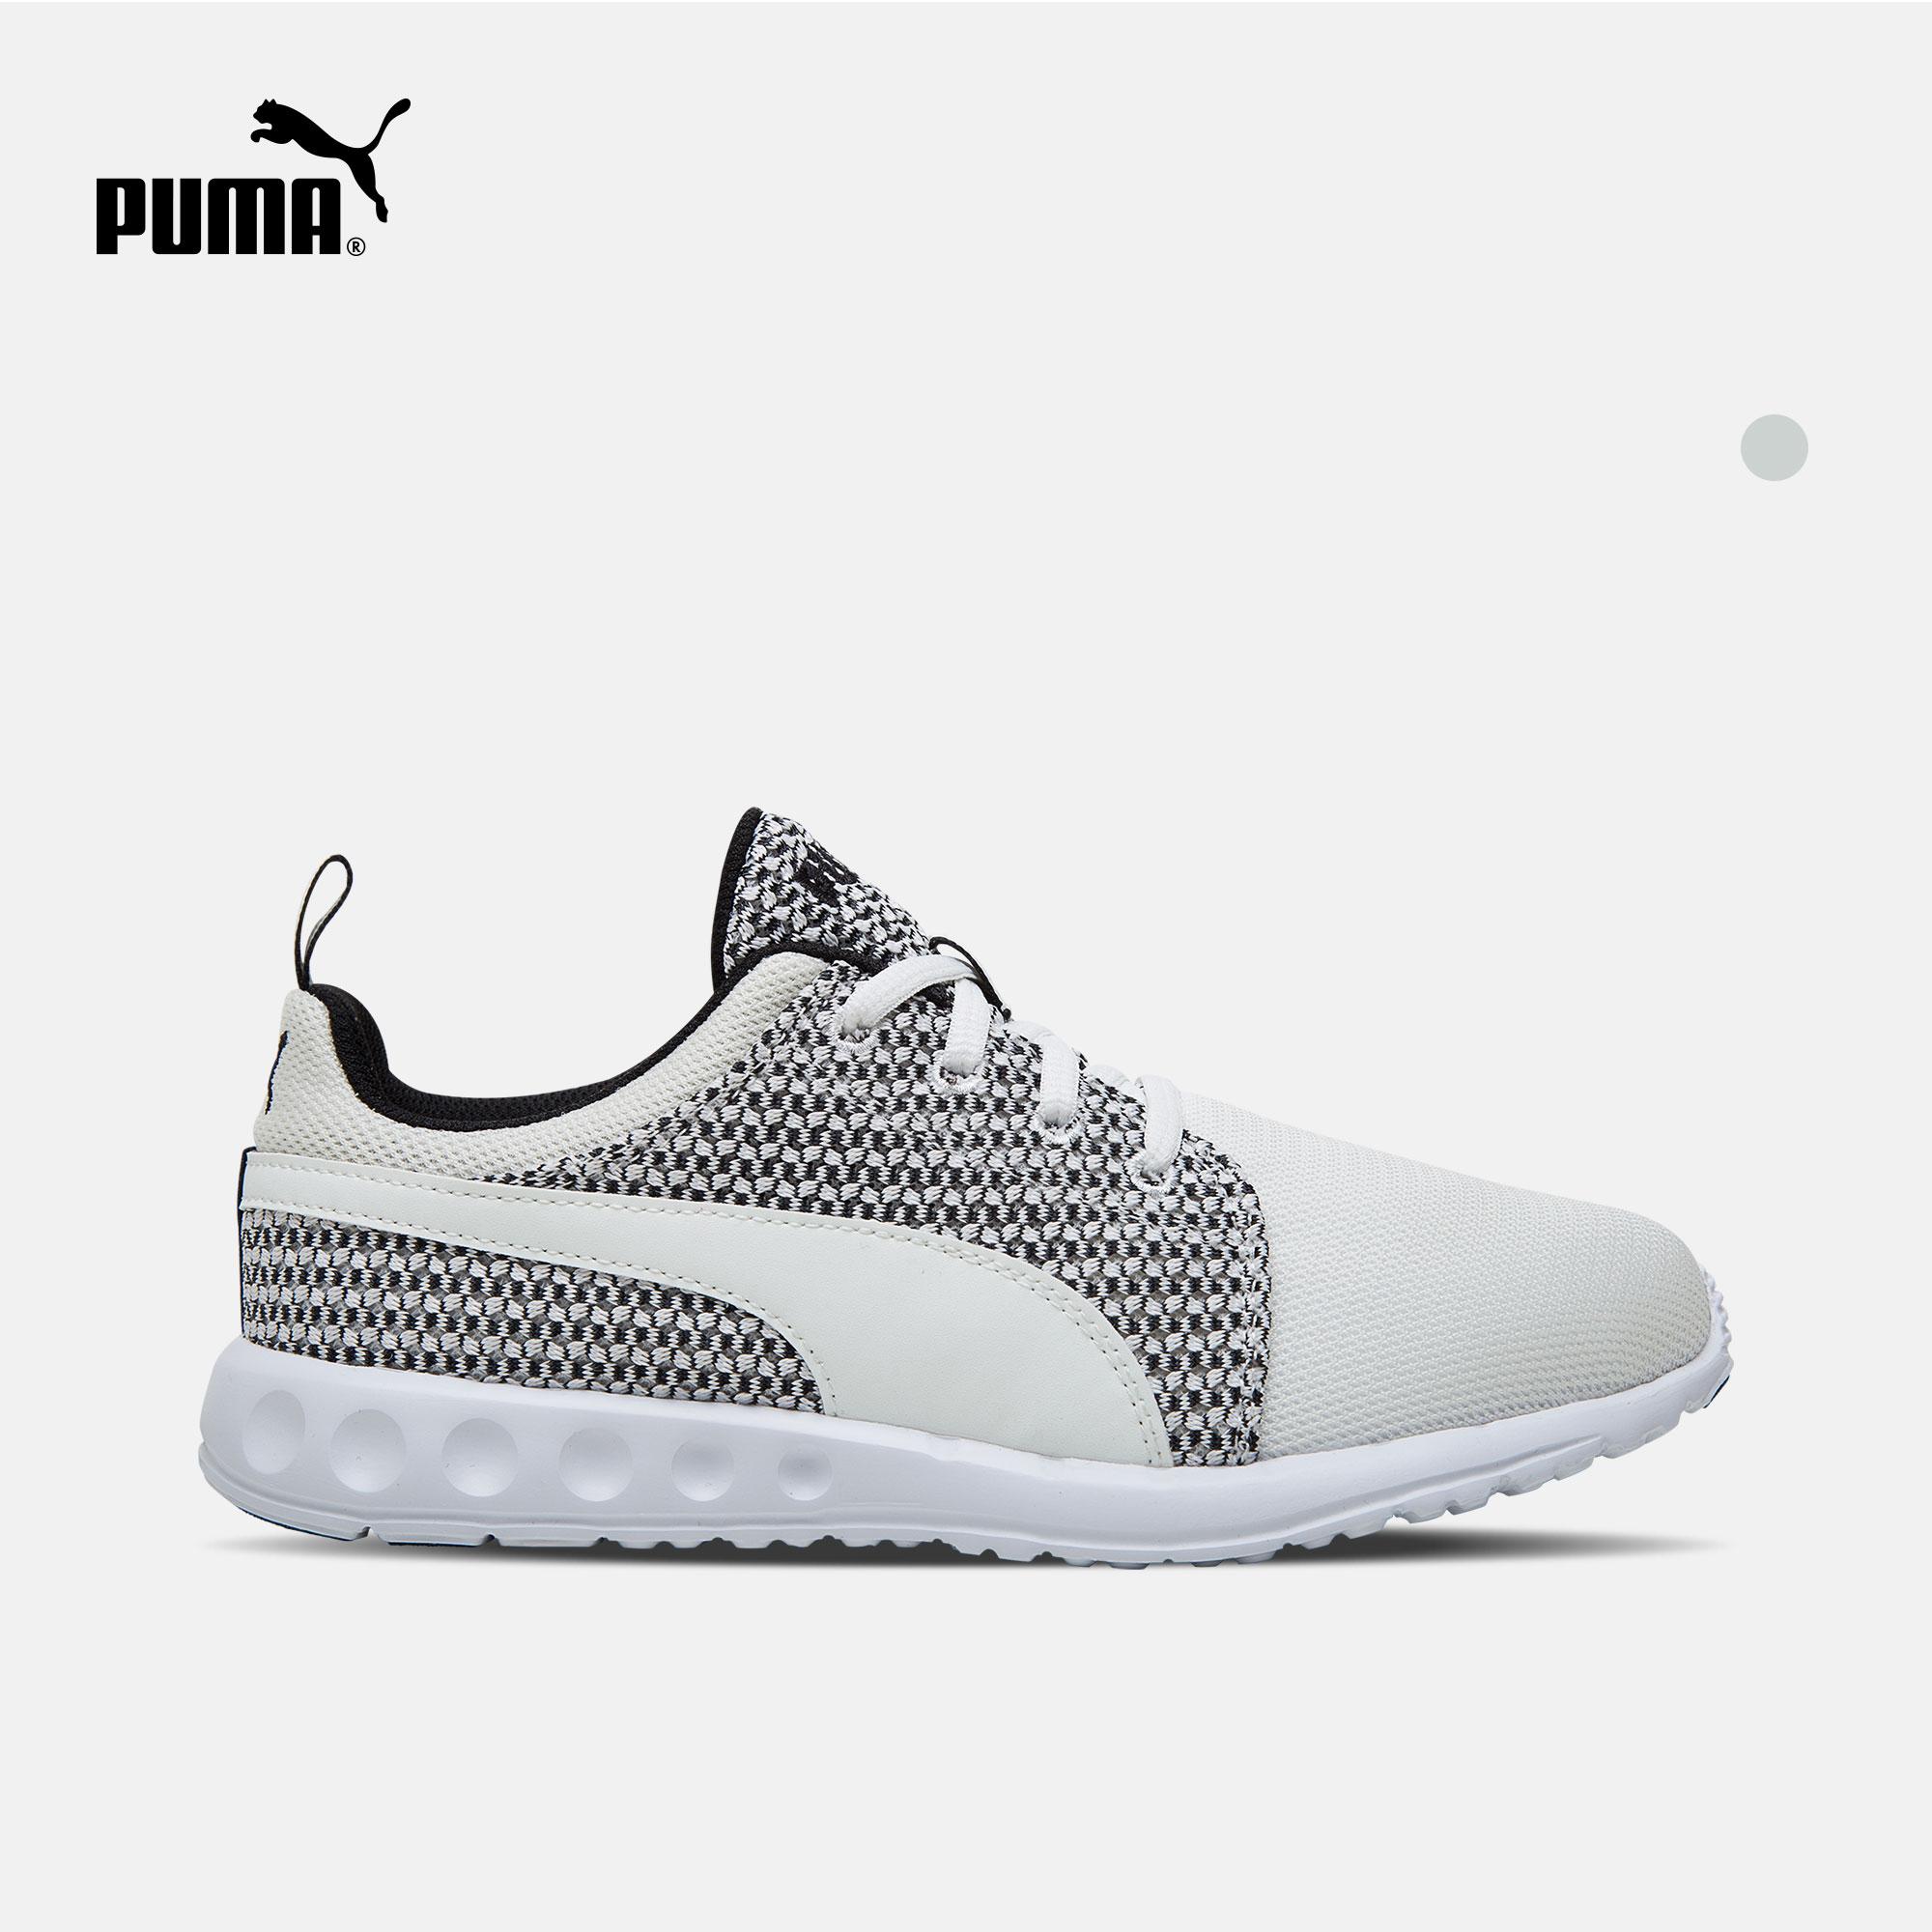 USD 133.13  Puma Puma official Women s running shoes Carson Runner ... e0d544e9a